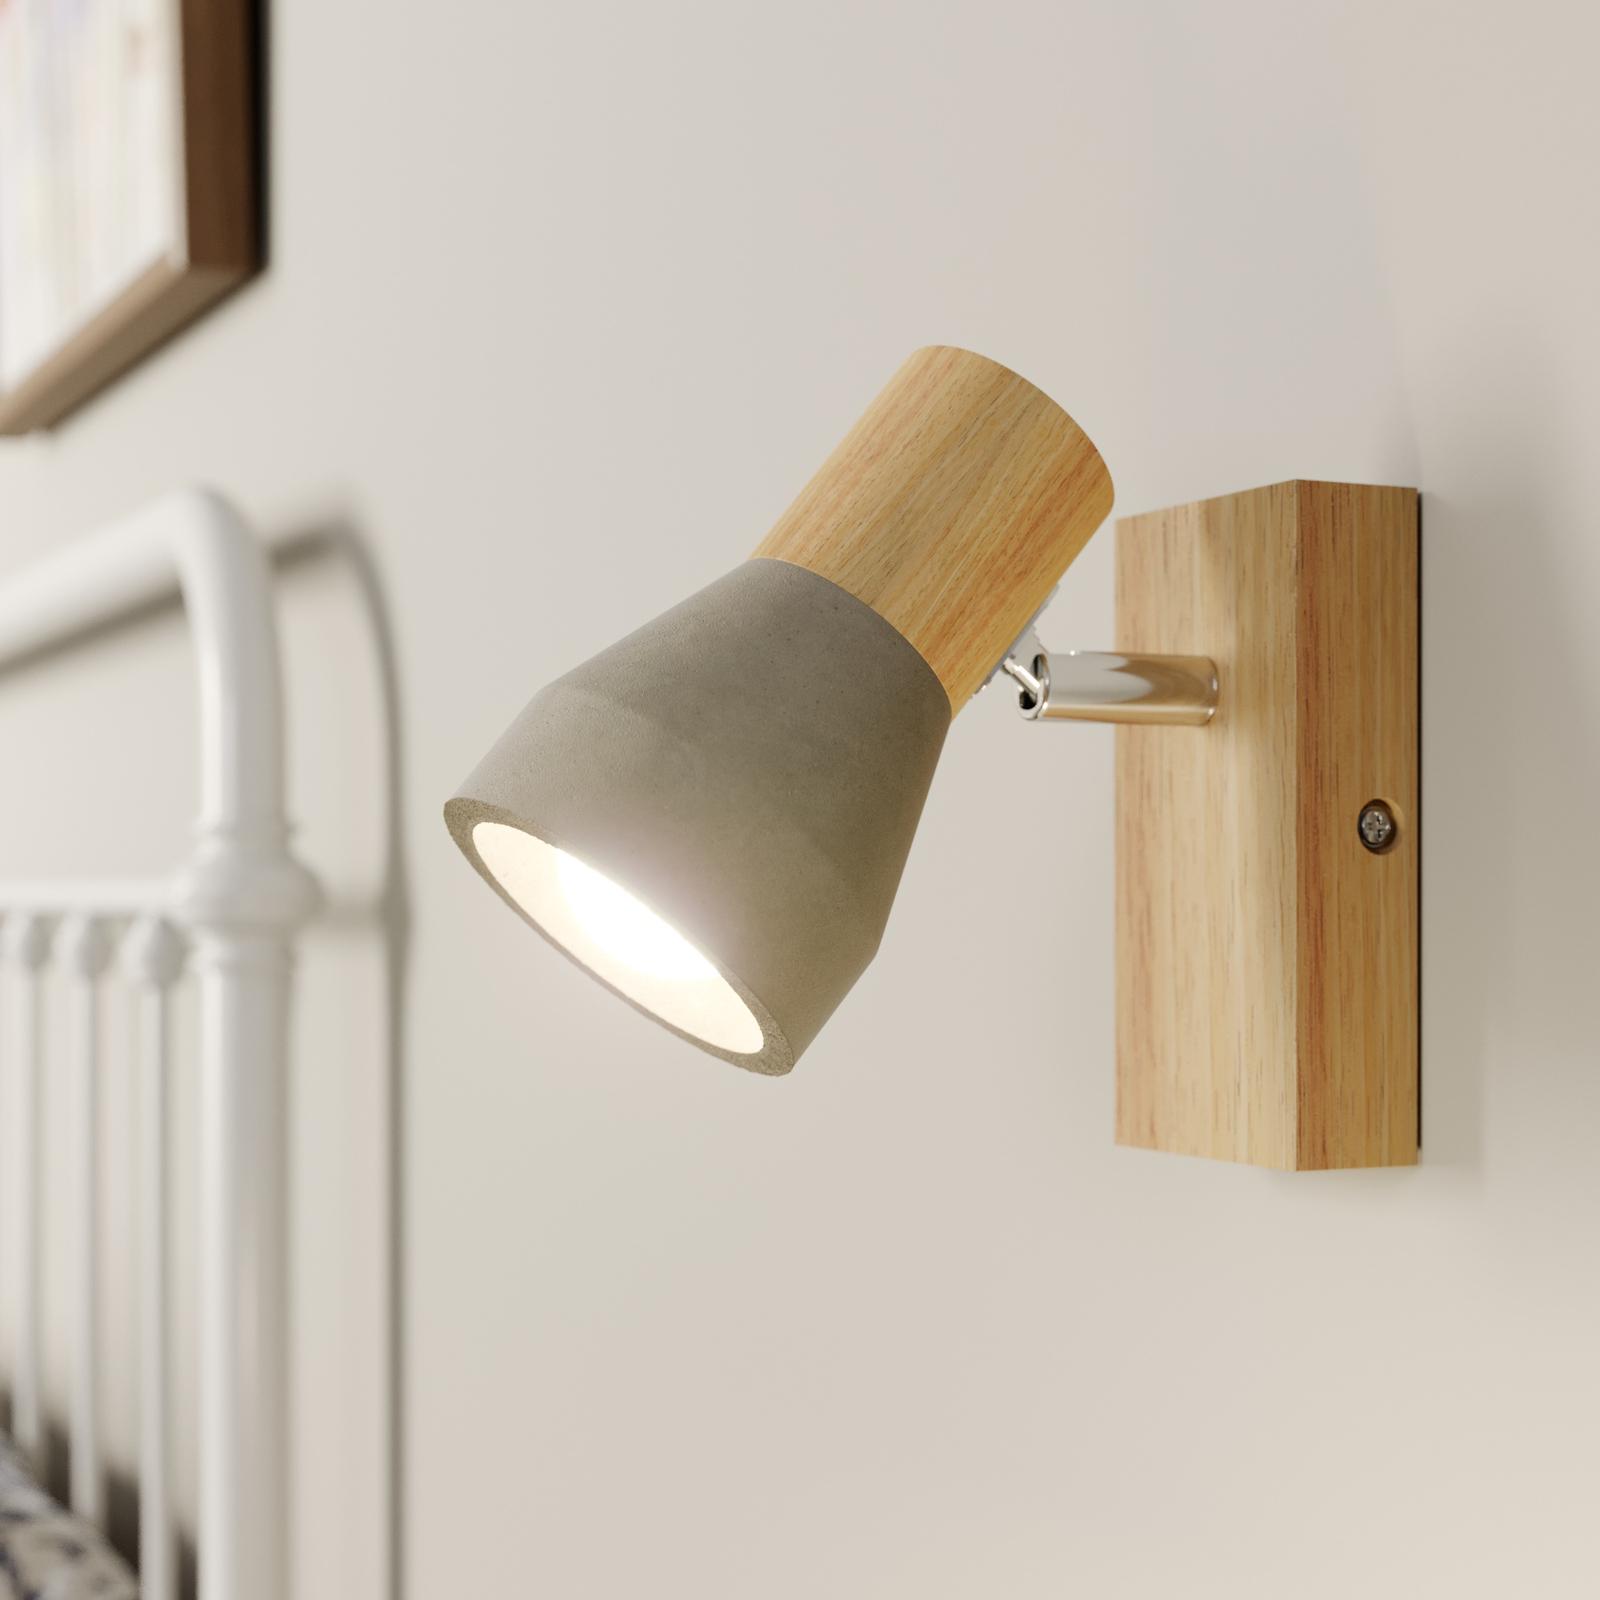 Filiz - LED spotlight made of wood and concrete_9621836_1